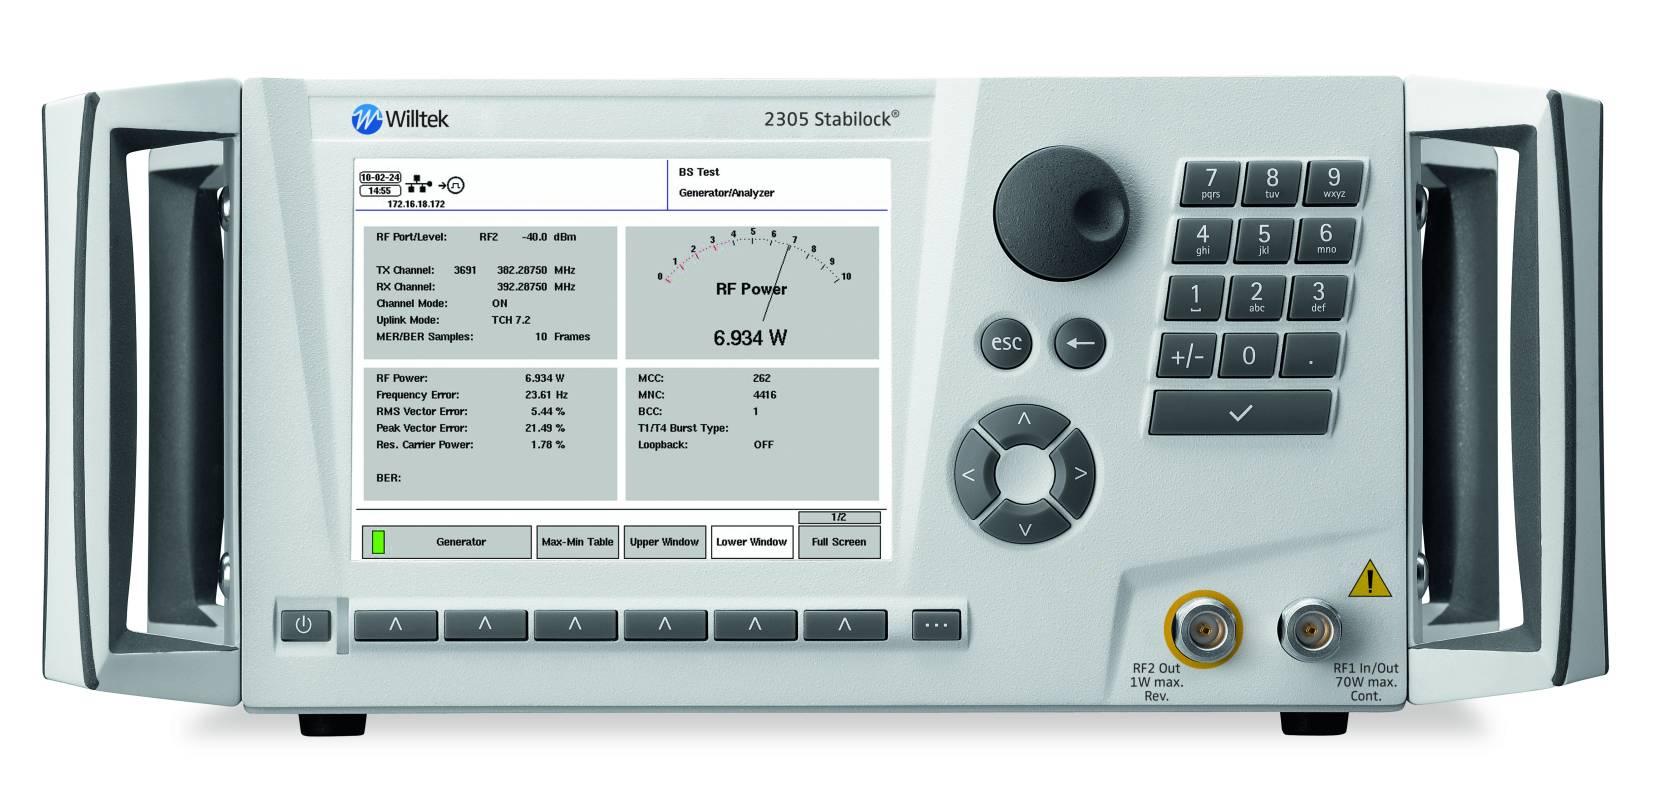 Aeroflex-Willtek-Stabilock-2305-TETRA-tester